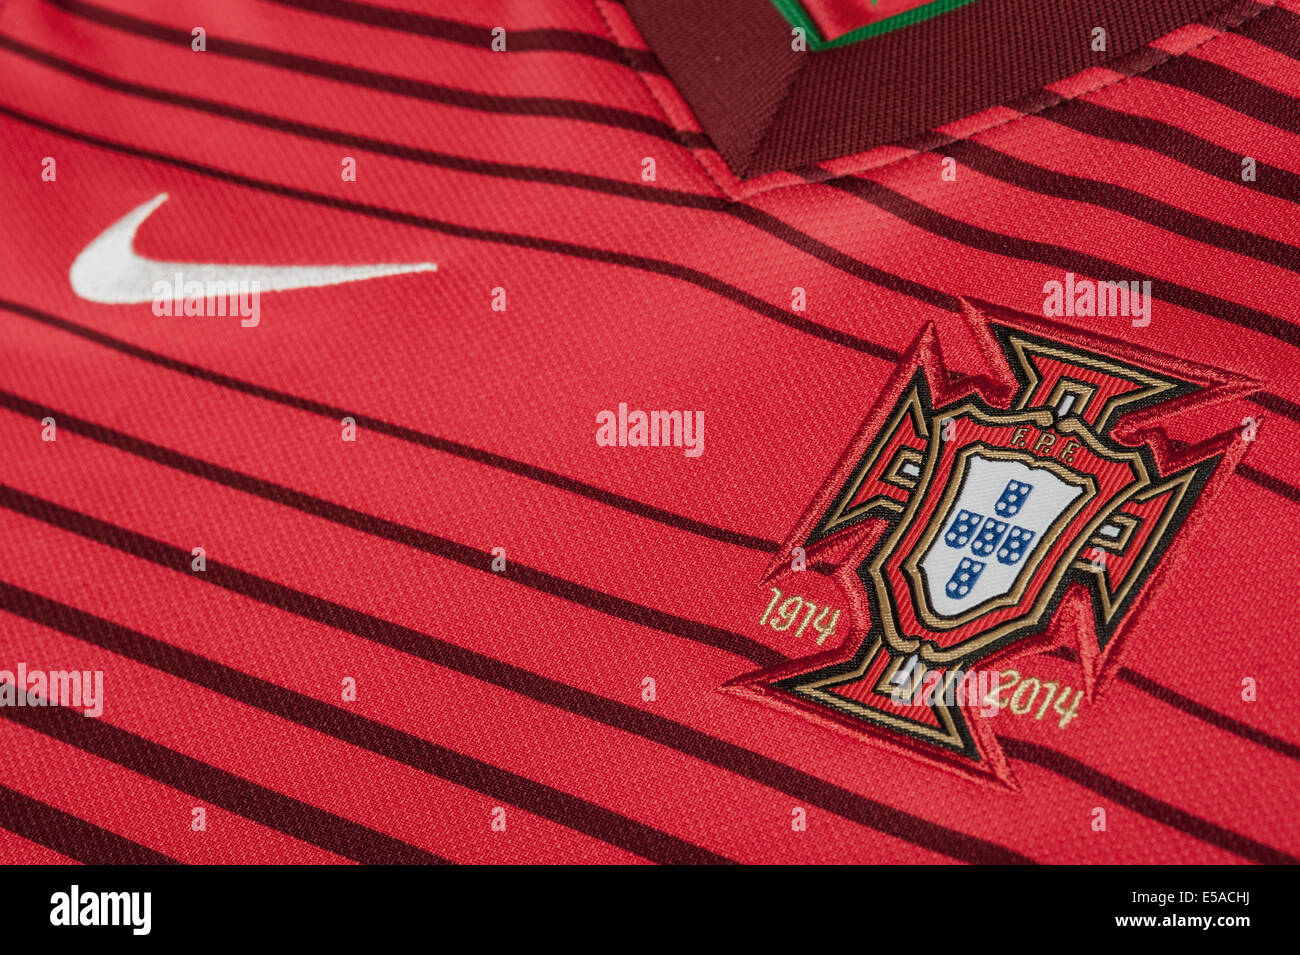 meet ad421 623a0 Portugal National Football Team Stock Photos & Portugal ...